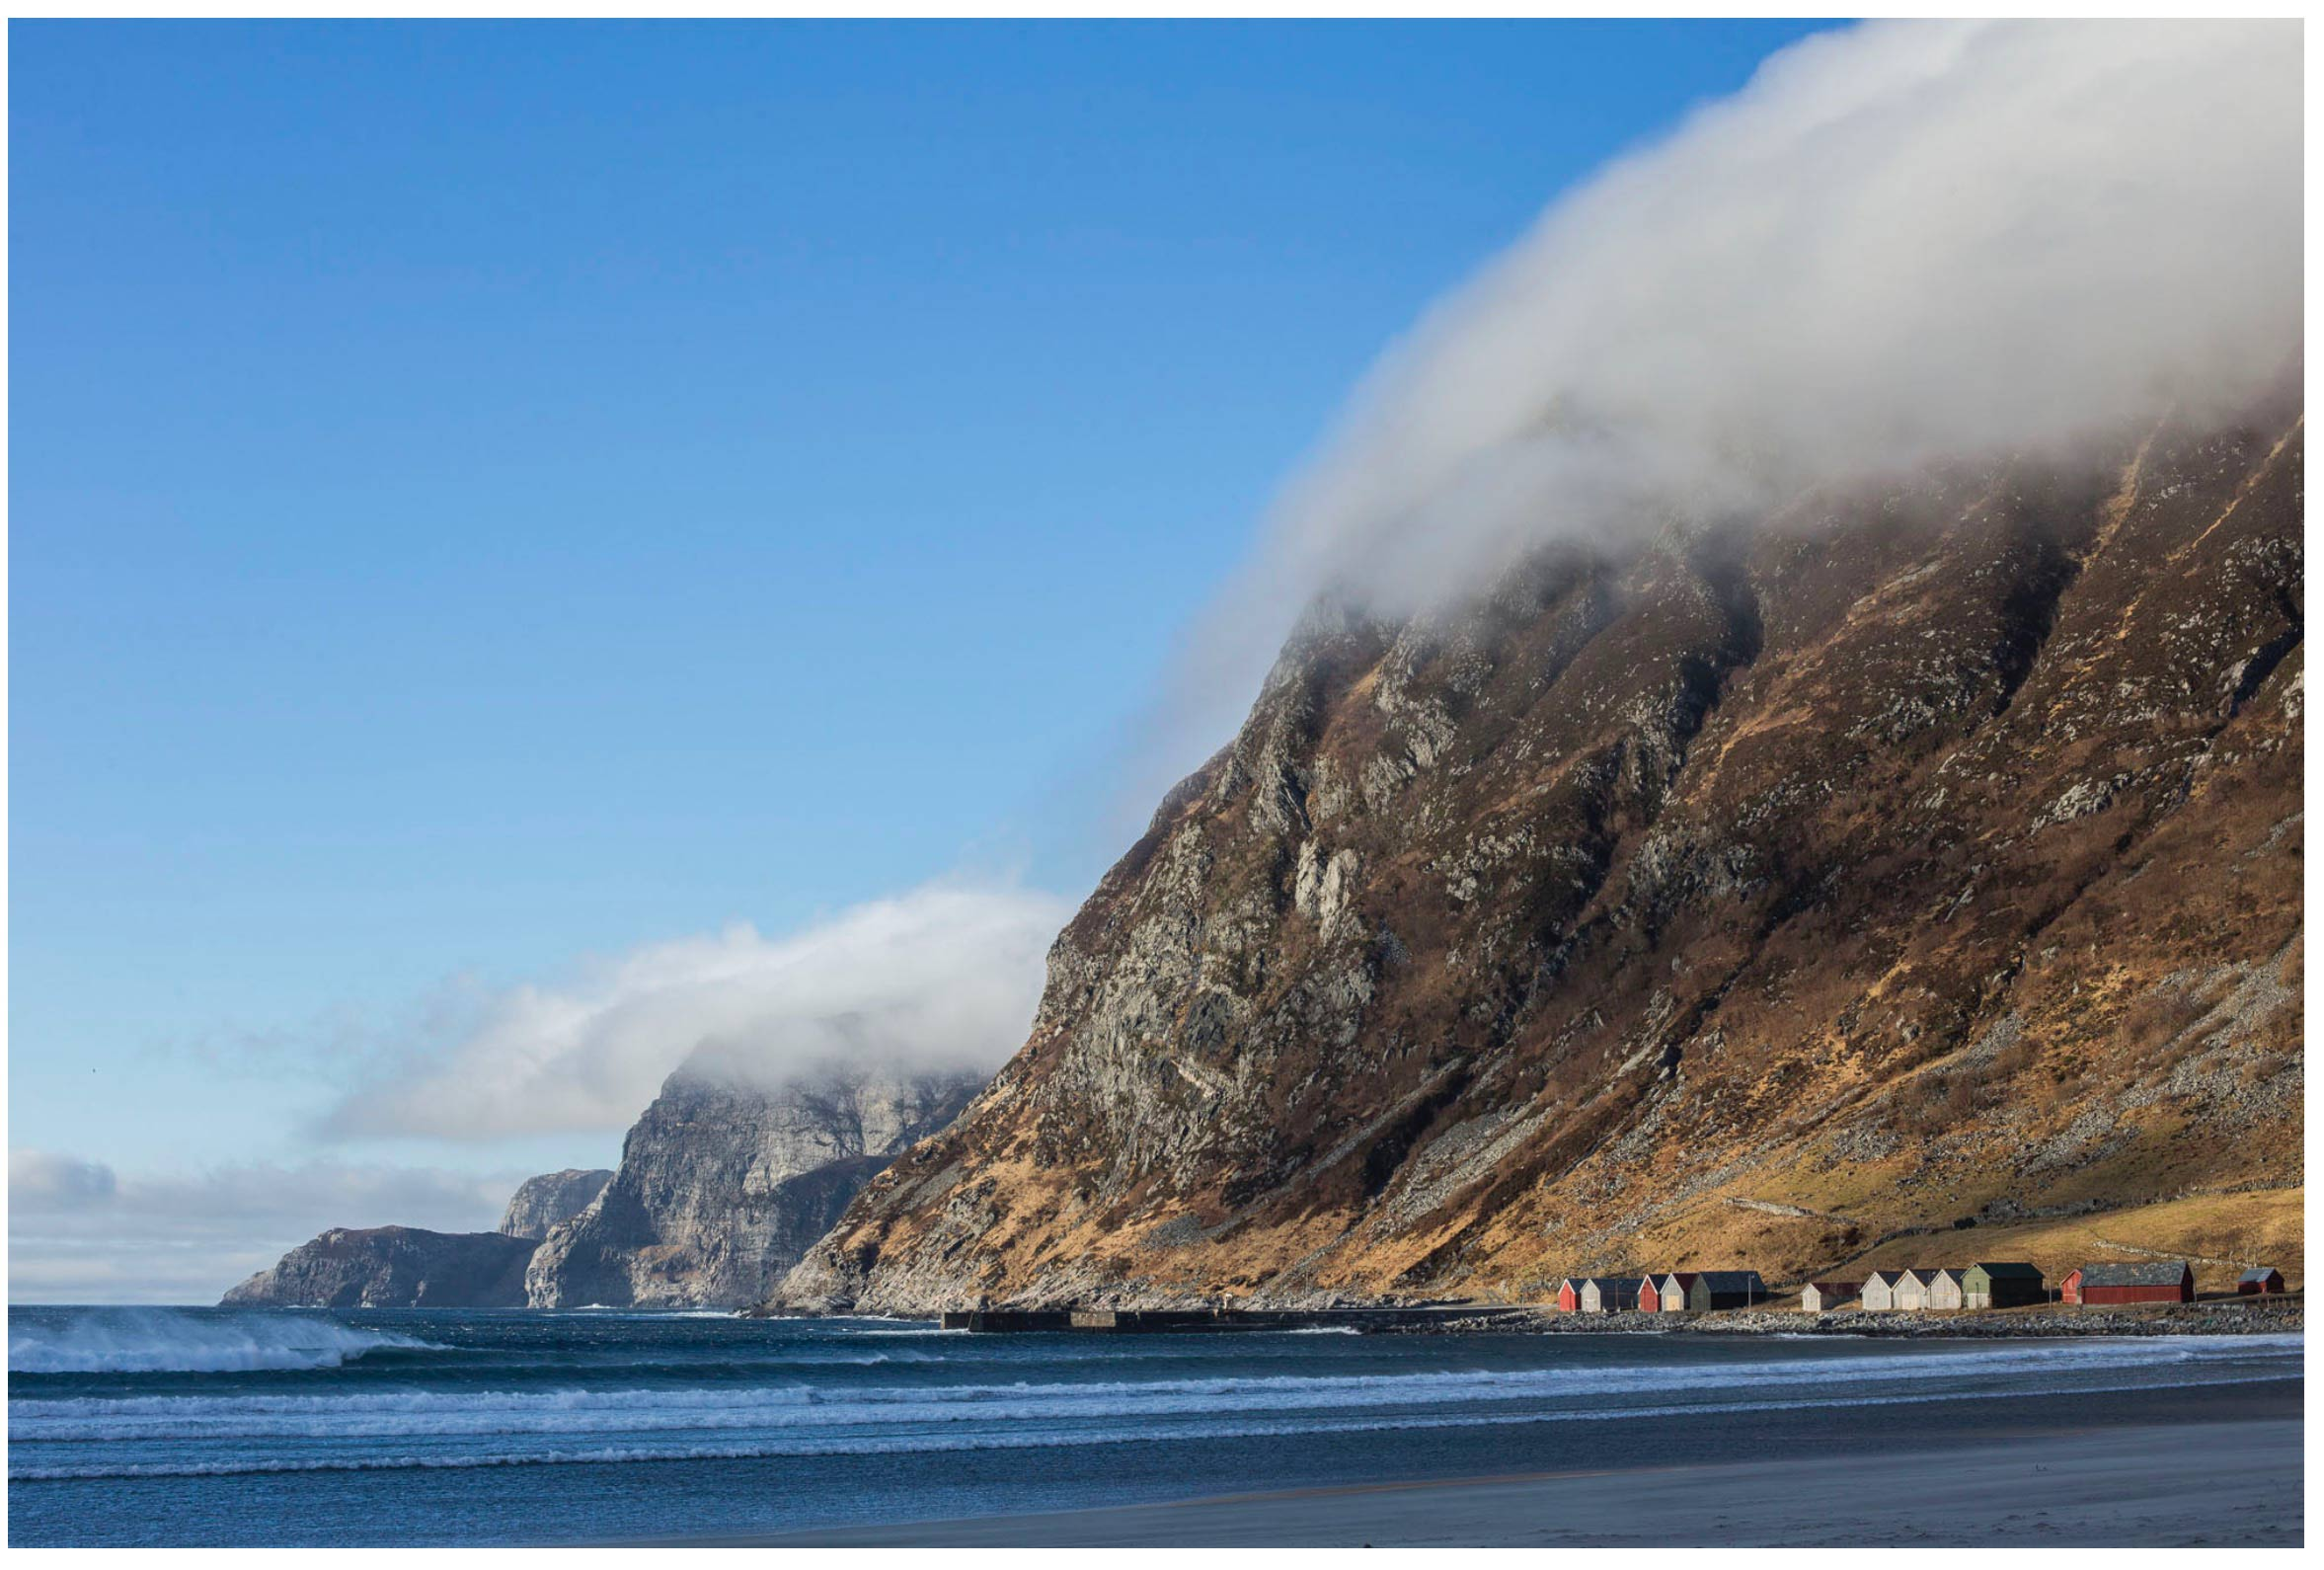 rodd-owen-ocean-surf-photography-artworks-for-sale-044.jpg